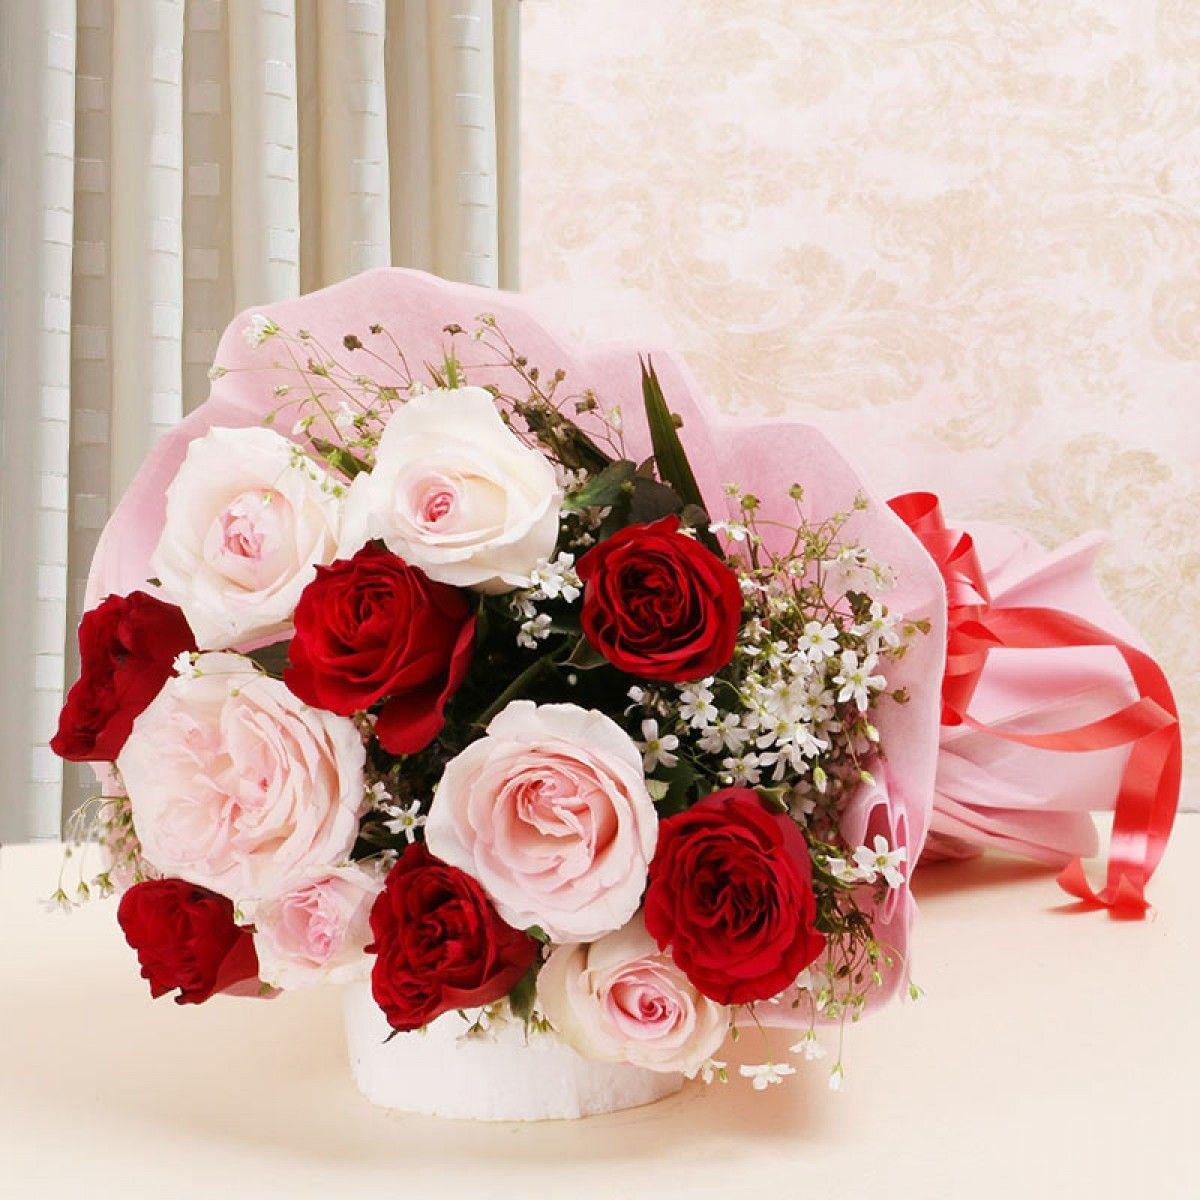 Online flowers delivery in delhi fresh flower delivery flowers online flowers delivery in delhi izmirmasajfo